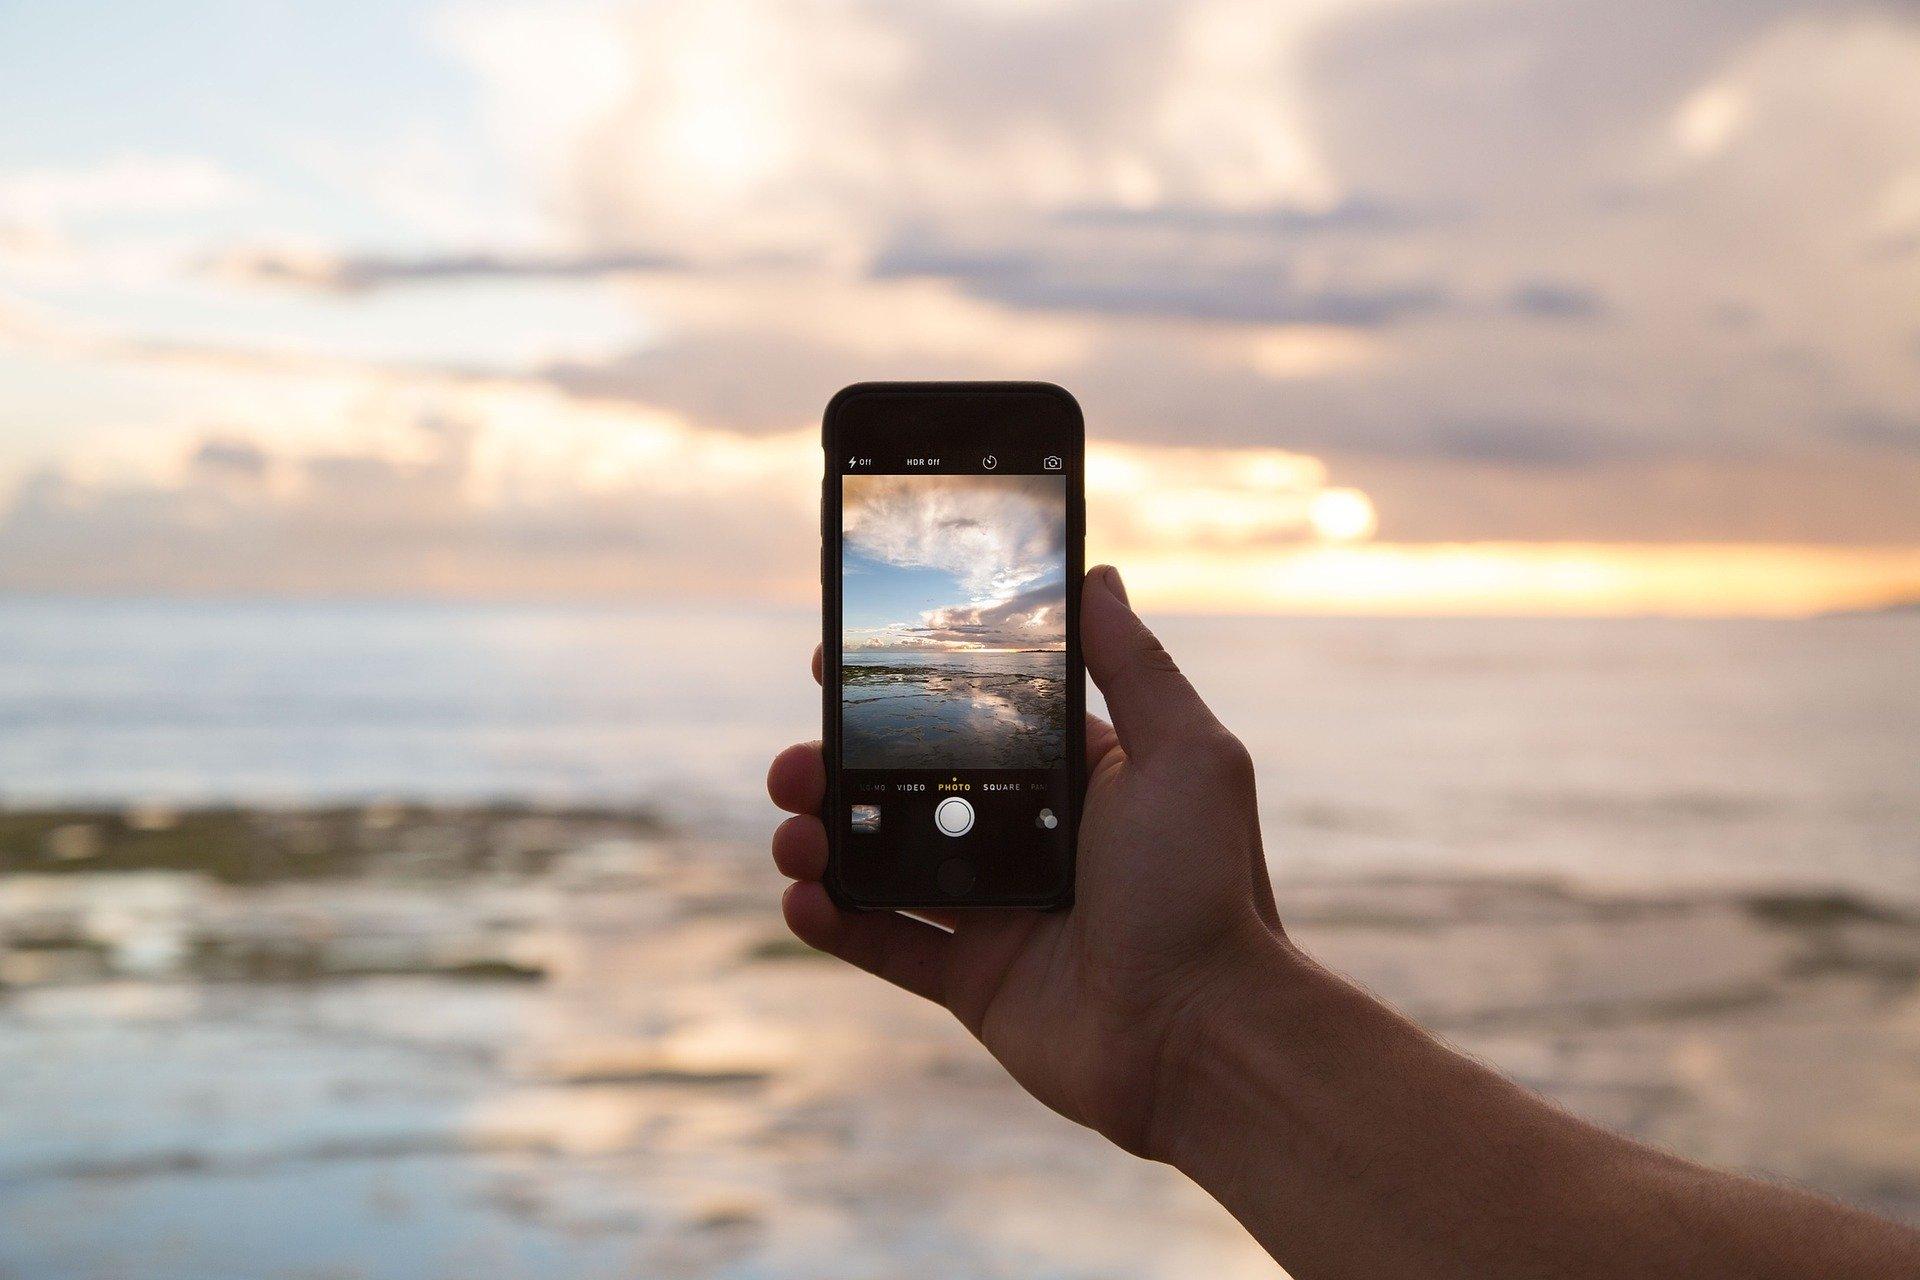 Smart phone held up against sky.